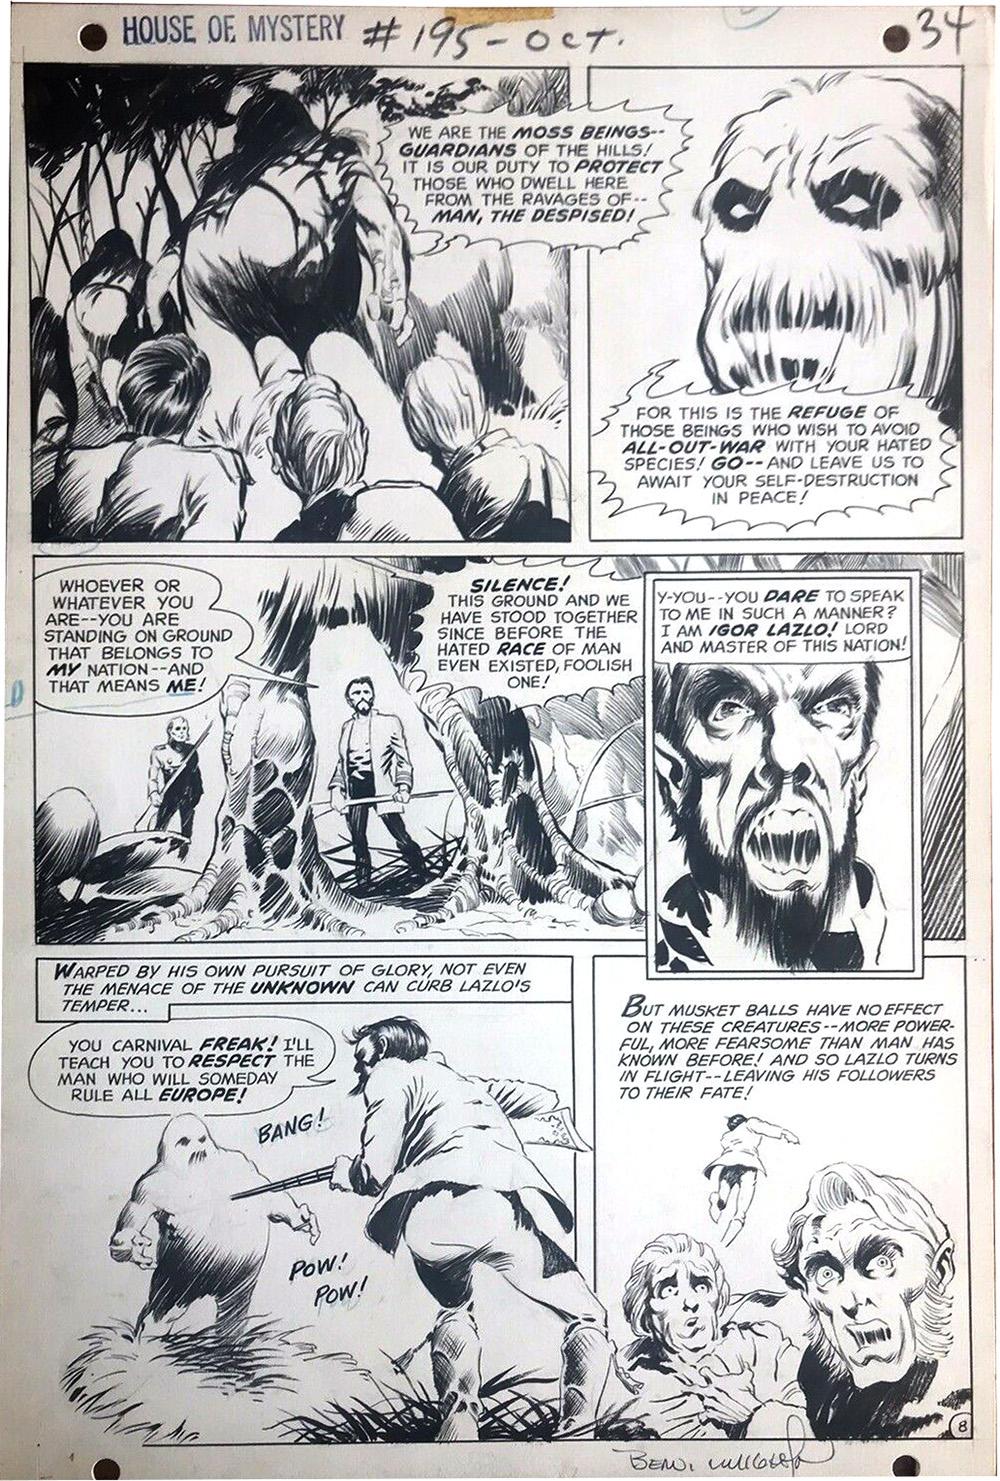 bernie-wrightson-original-comic-art